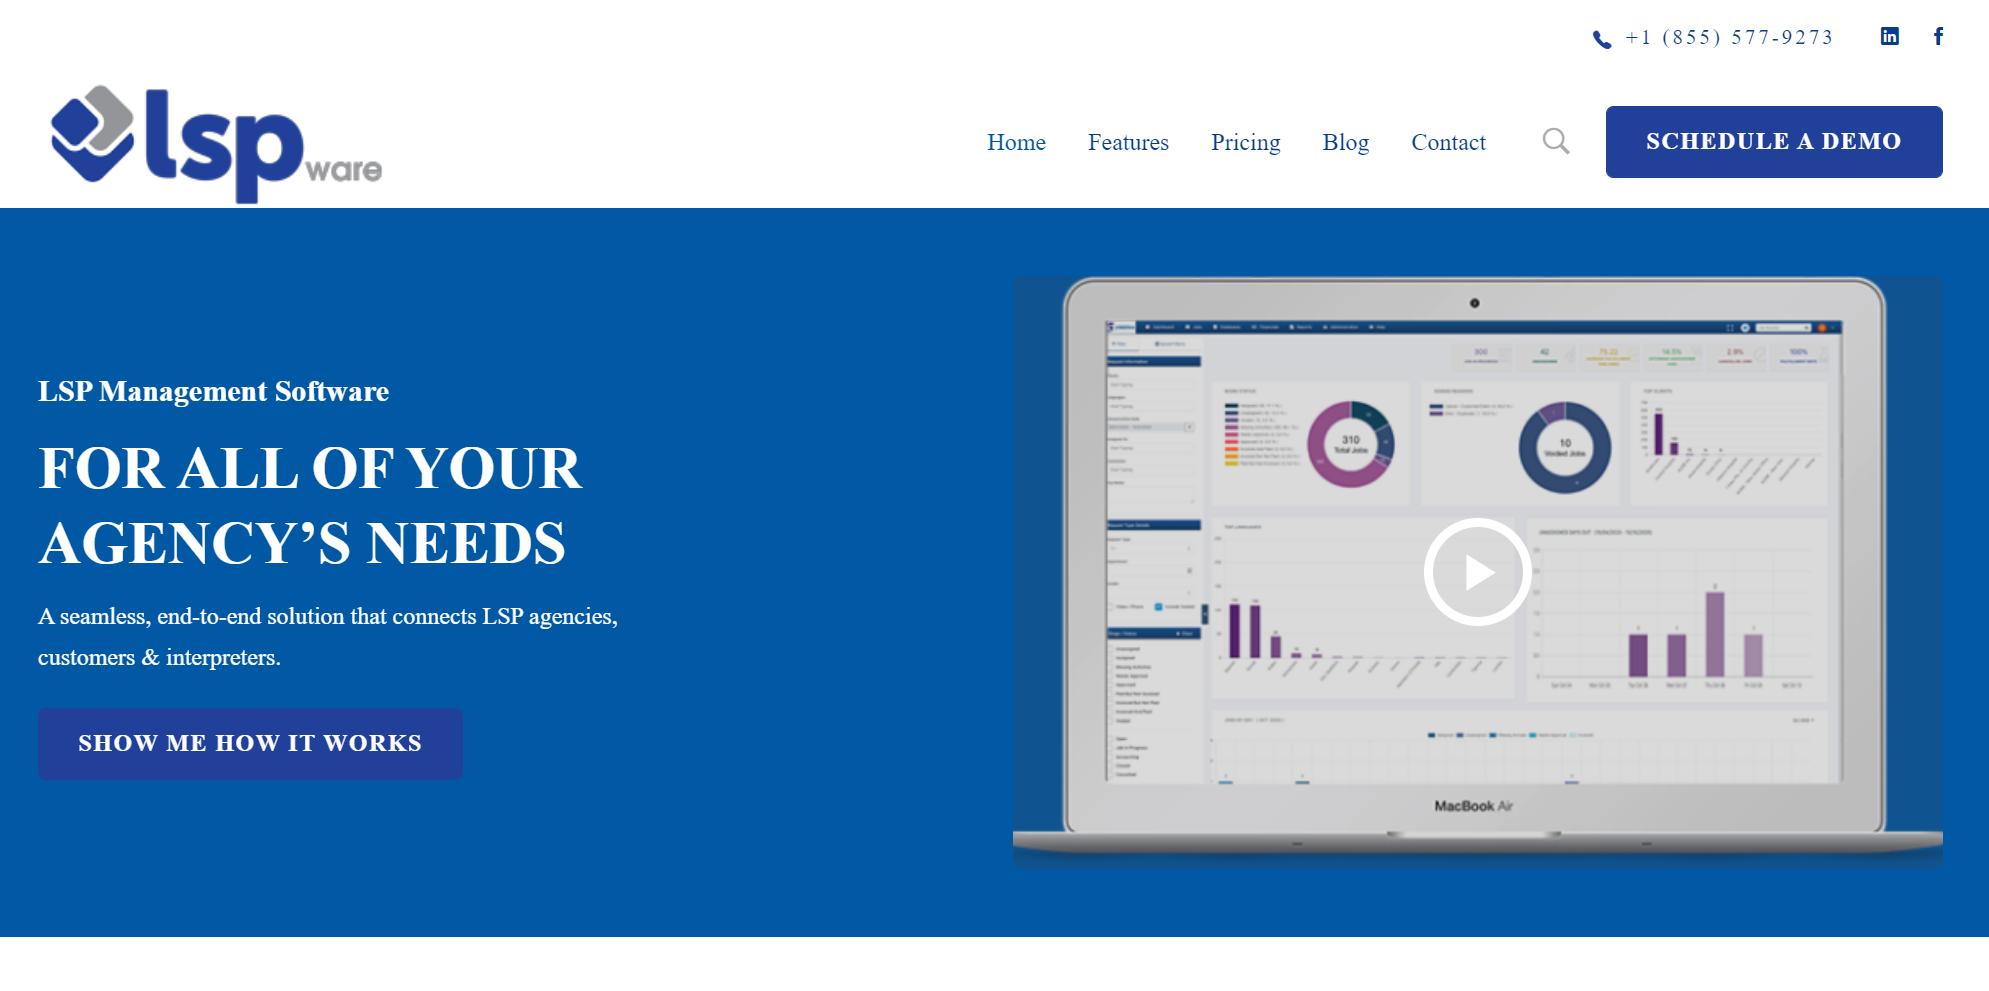 LSP Management Software